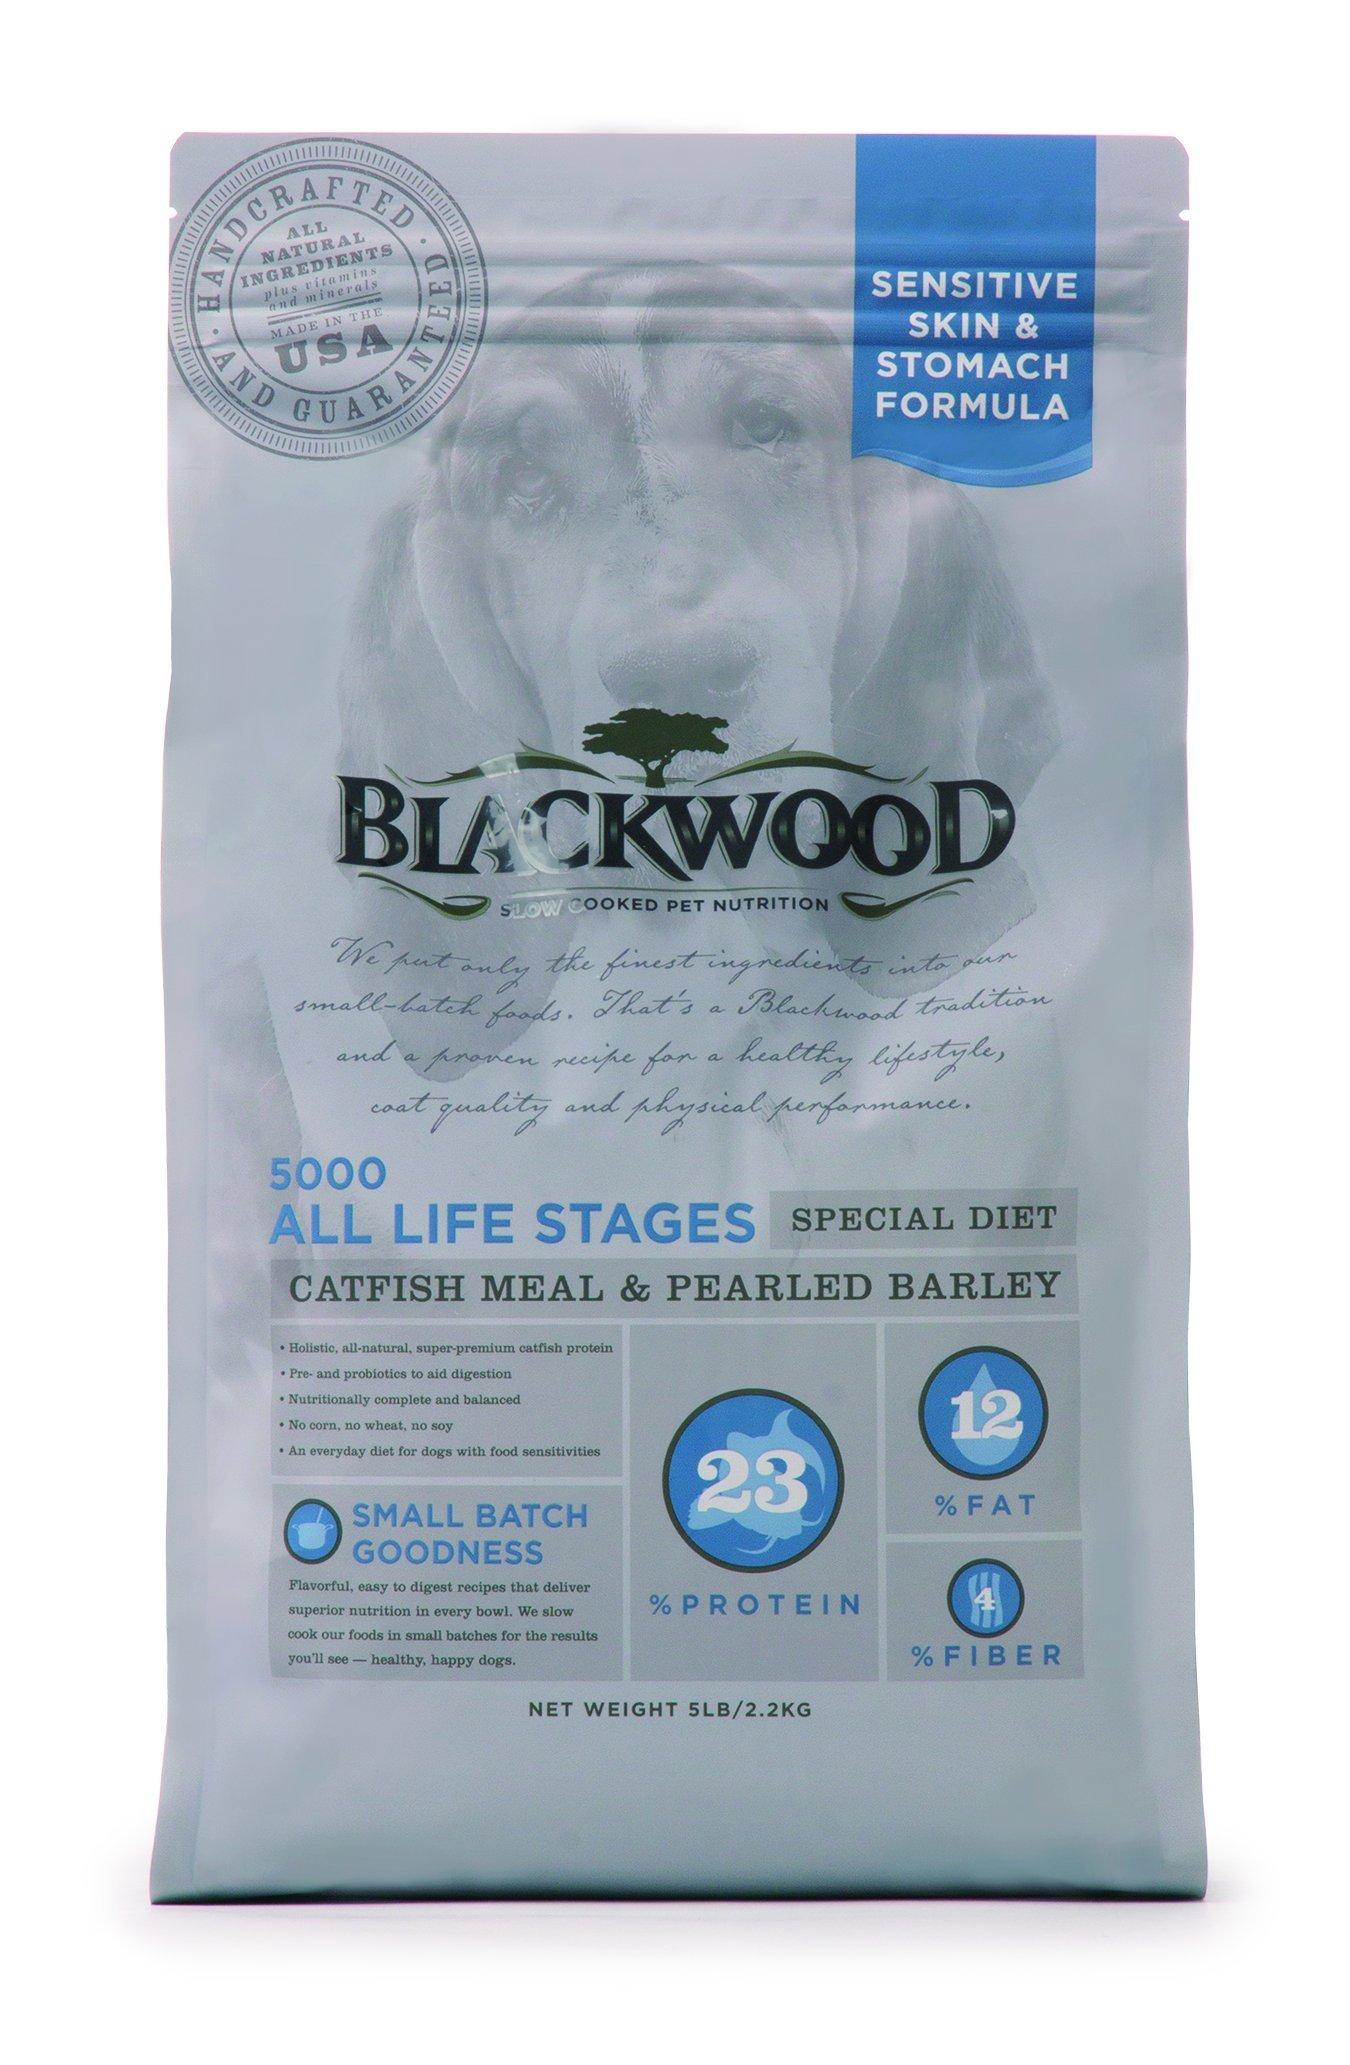 Blackwood Pet Food 22257 All Life Stages, Special Diet, Sensitive Skin, Catfish Meal & Pearled Barley, 30lb.